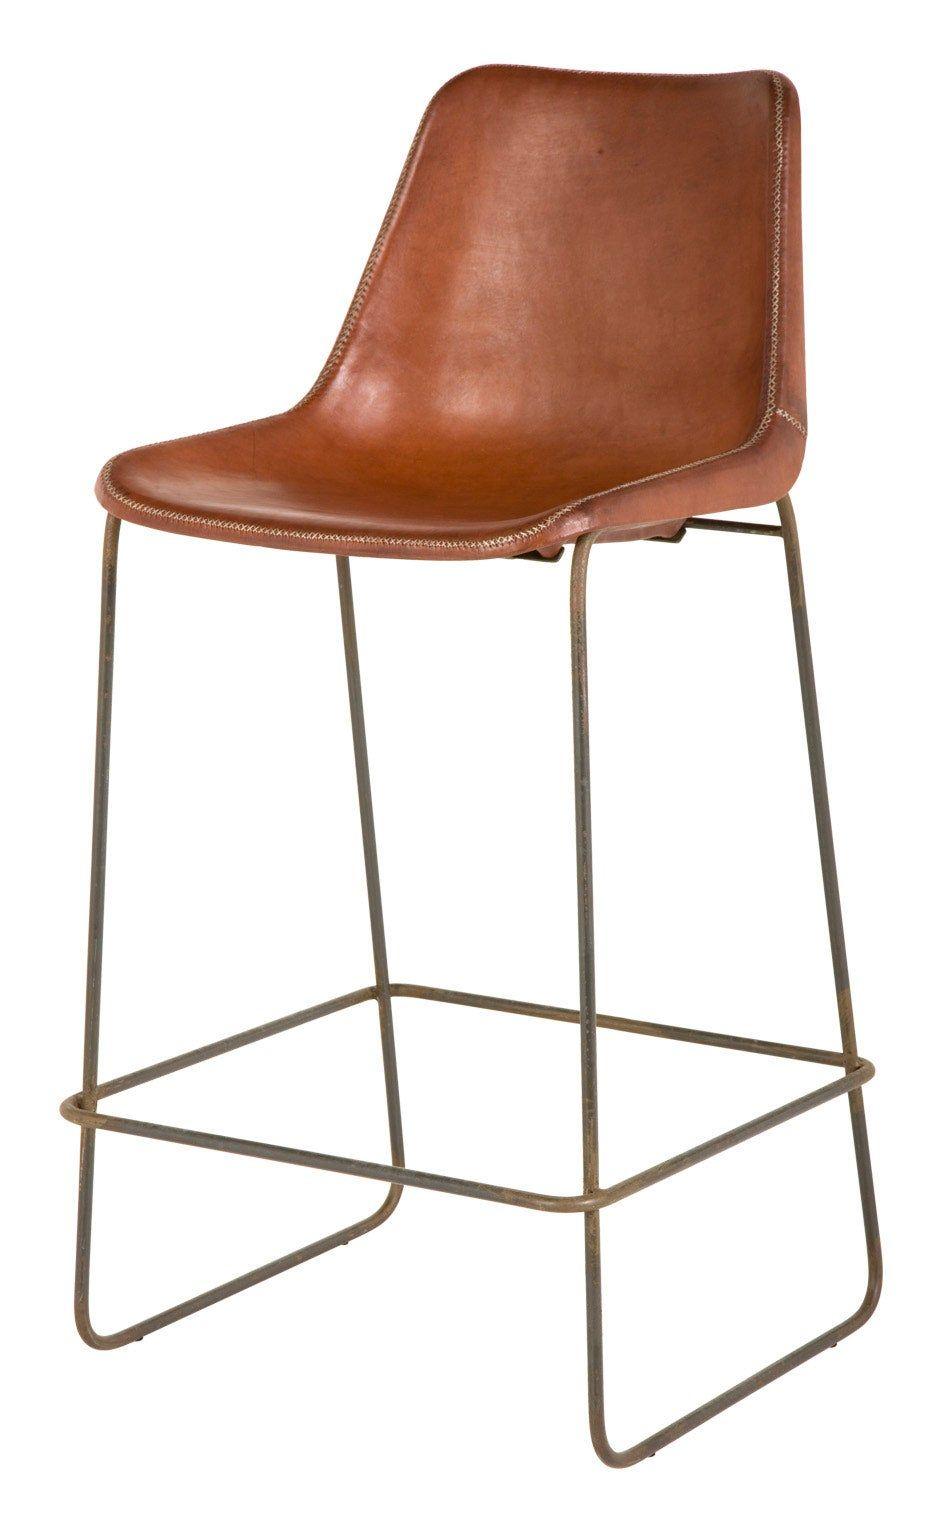 Fernando Bar Stool Brown Stools Furniture Jayson Home Leather Bar Stools Modern Bar Stools Brown Leather Bar Stools